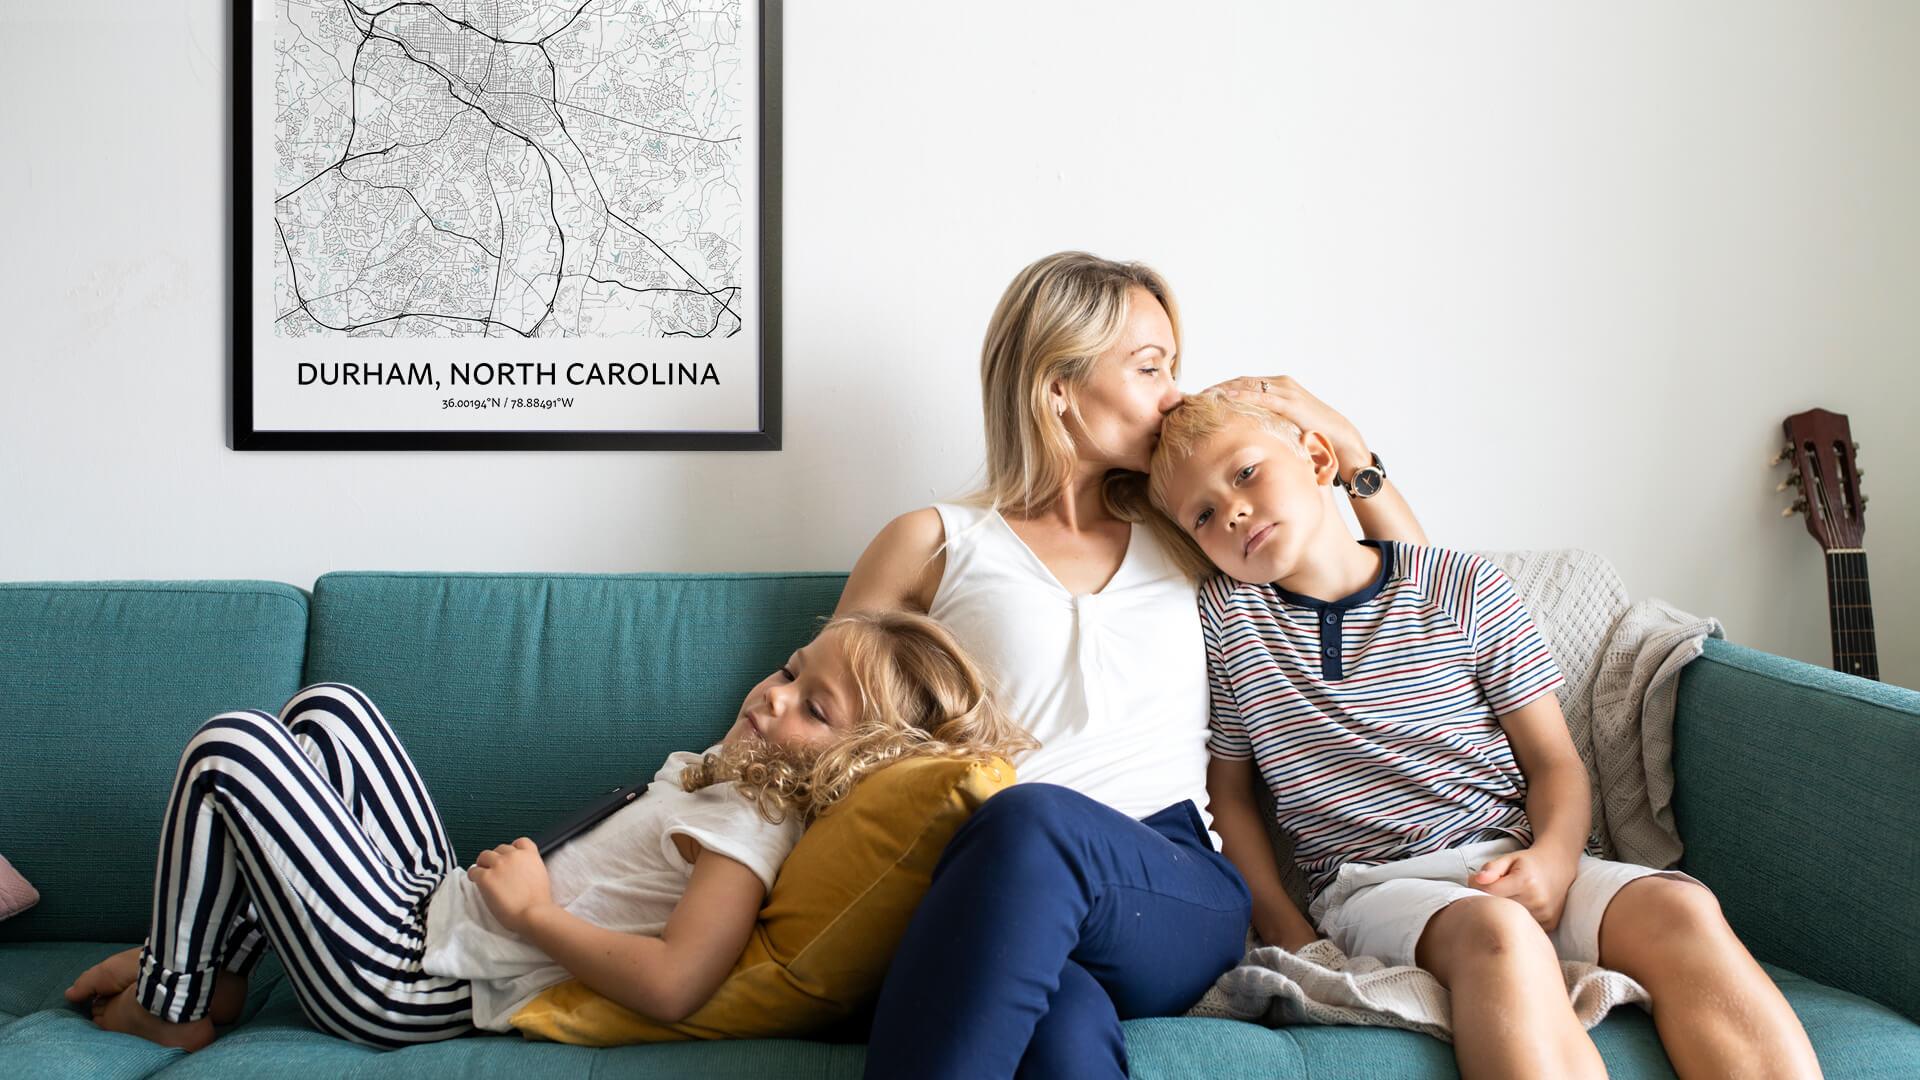 Durham North Carolina map poster